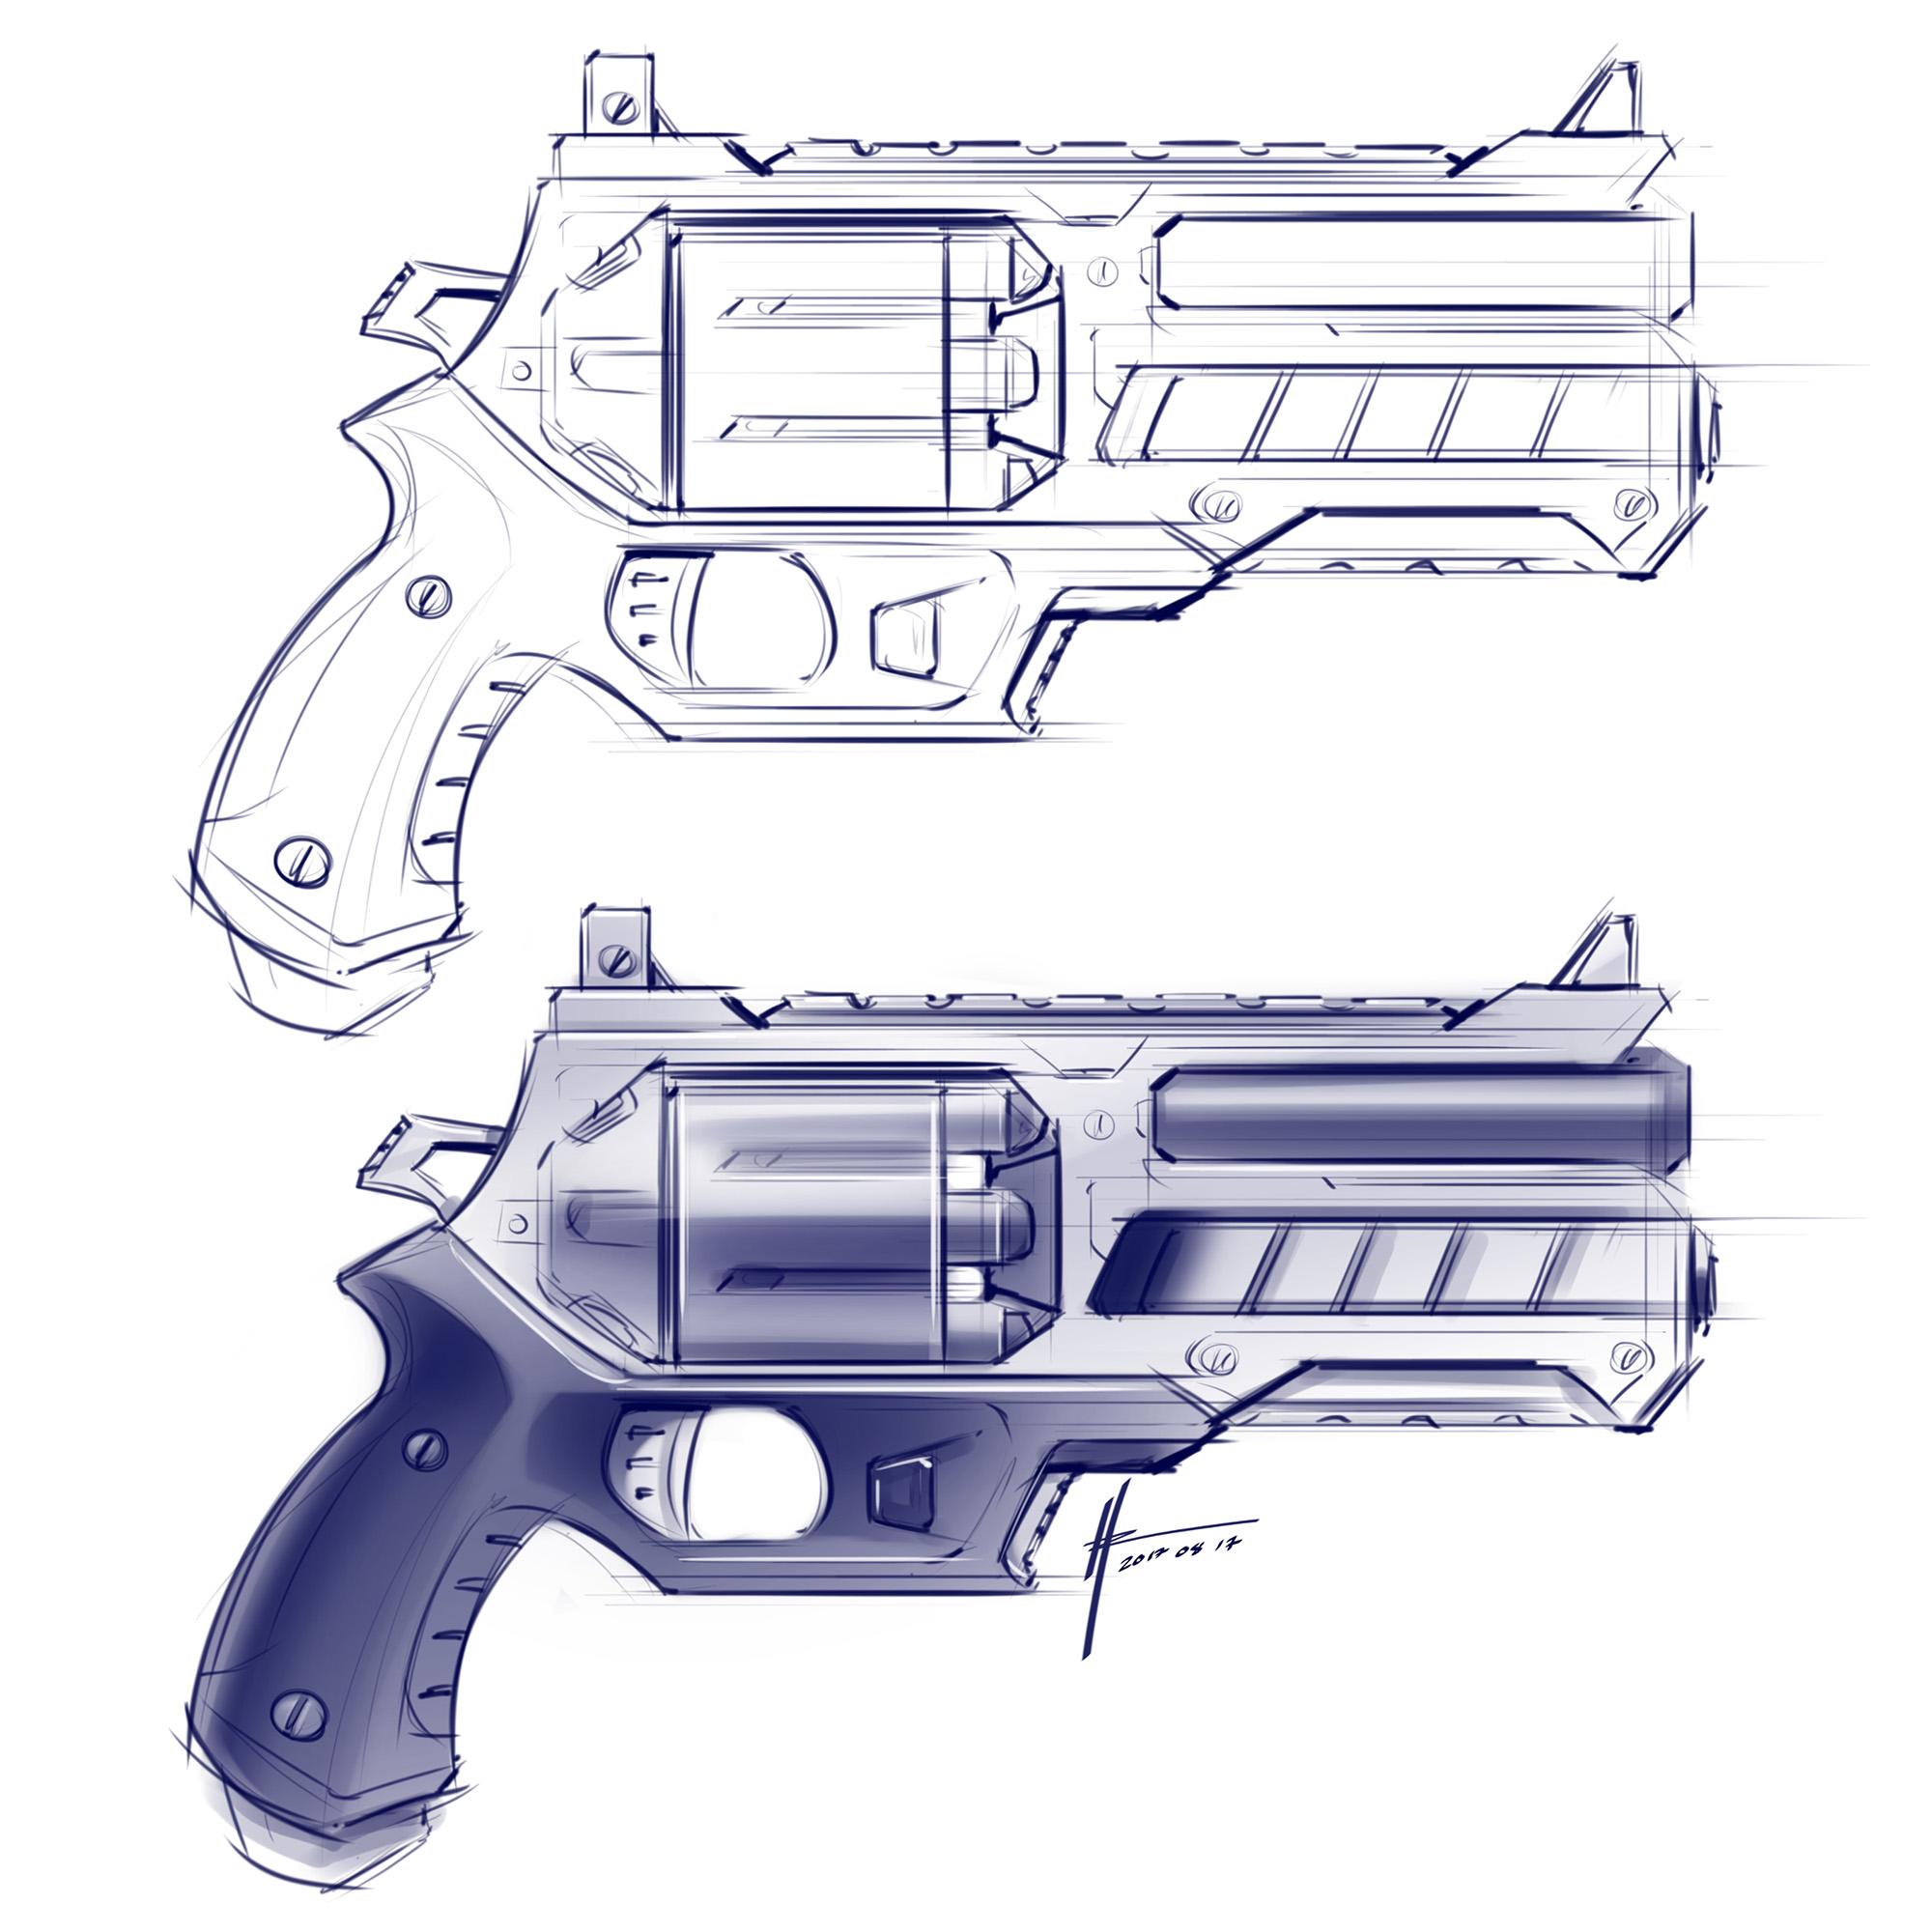 20170807_Revolver.jpg